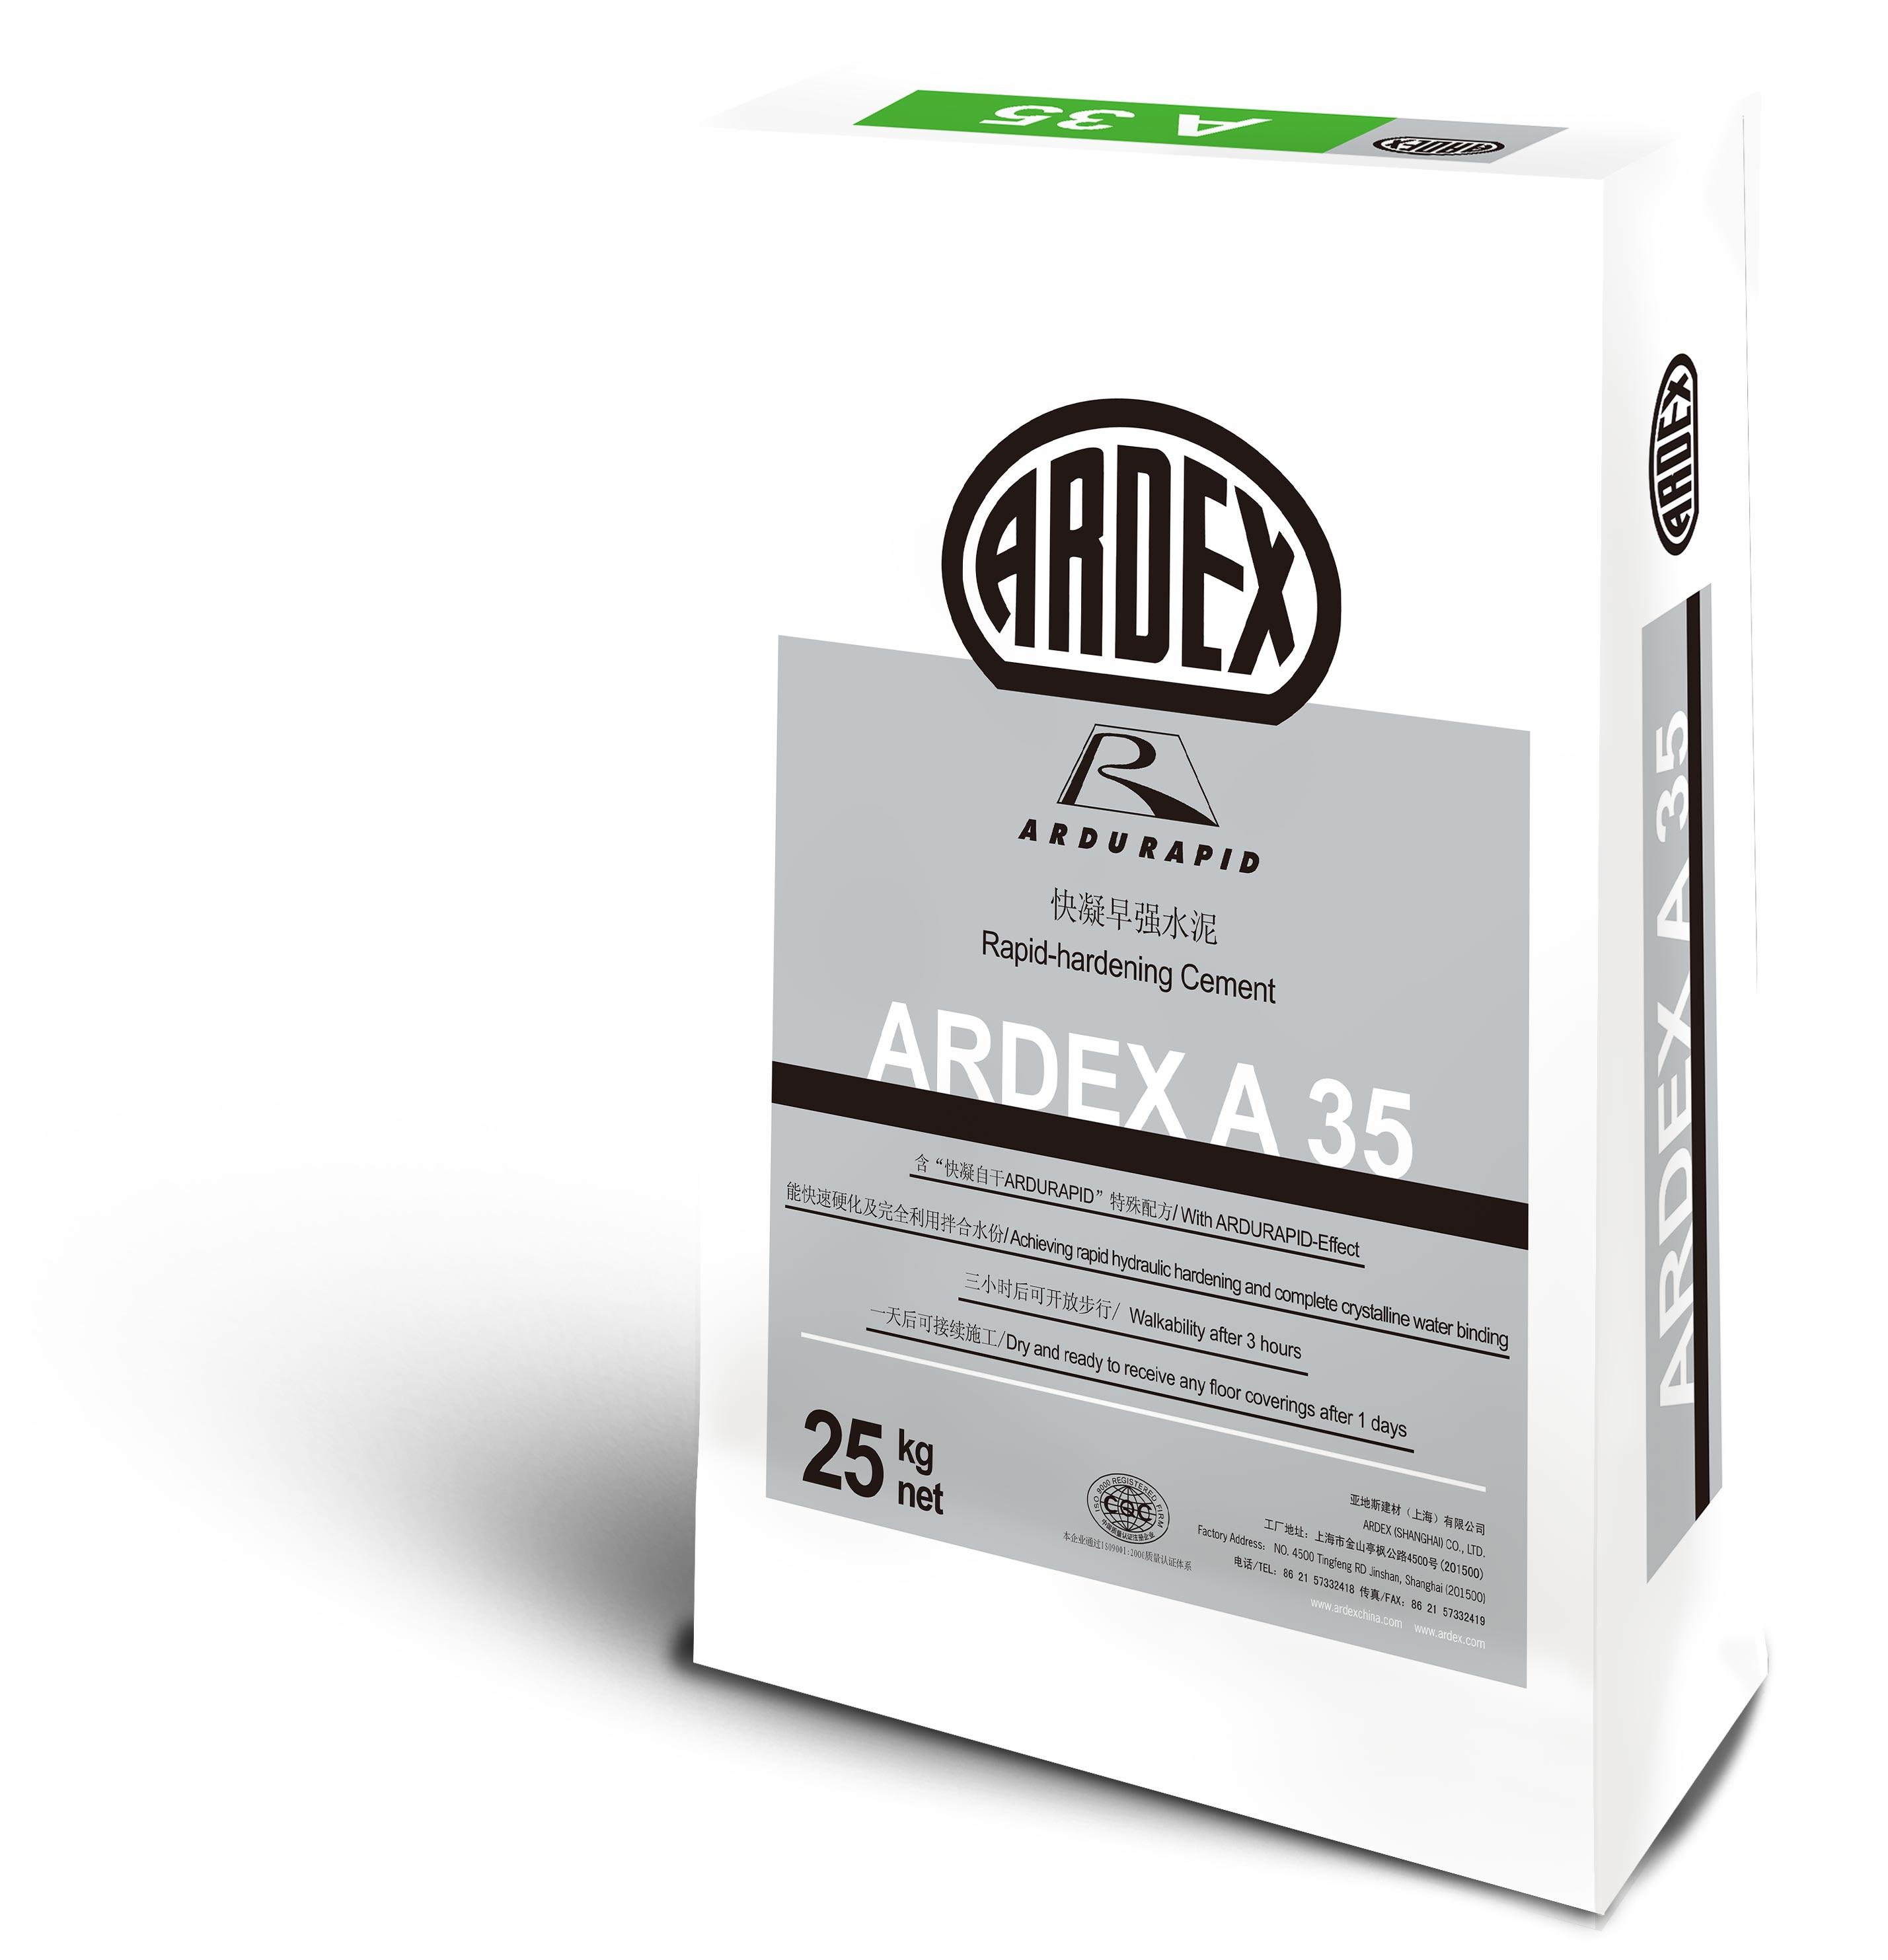 ARDEX A 35